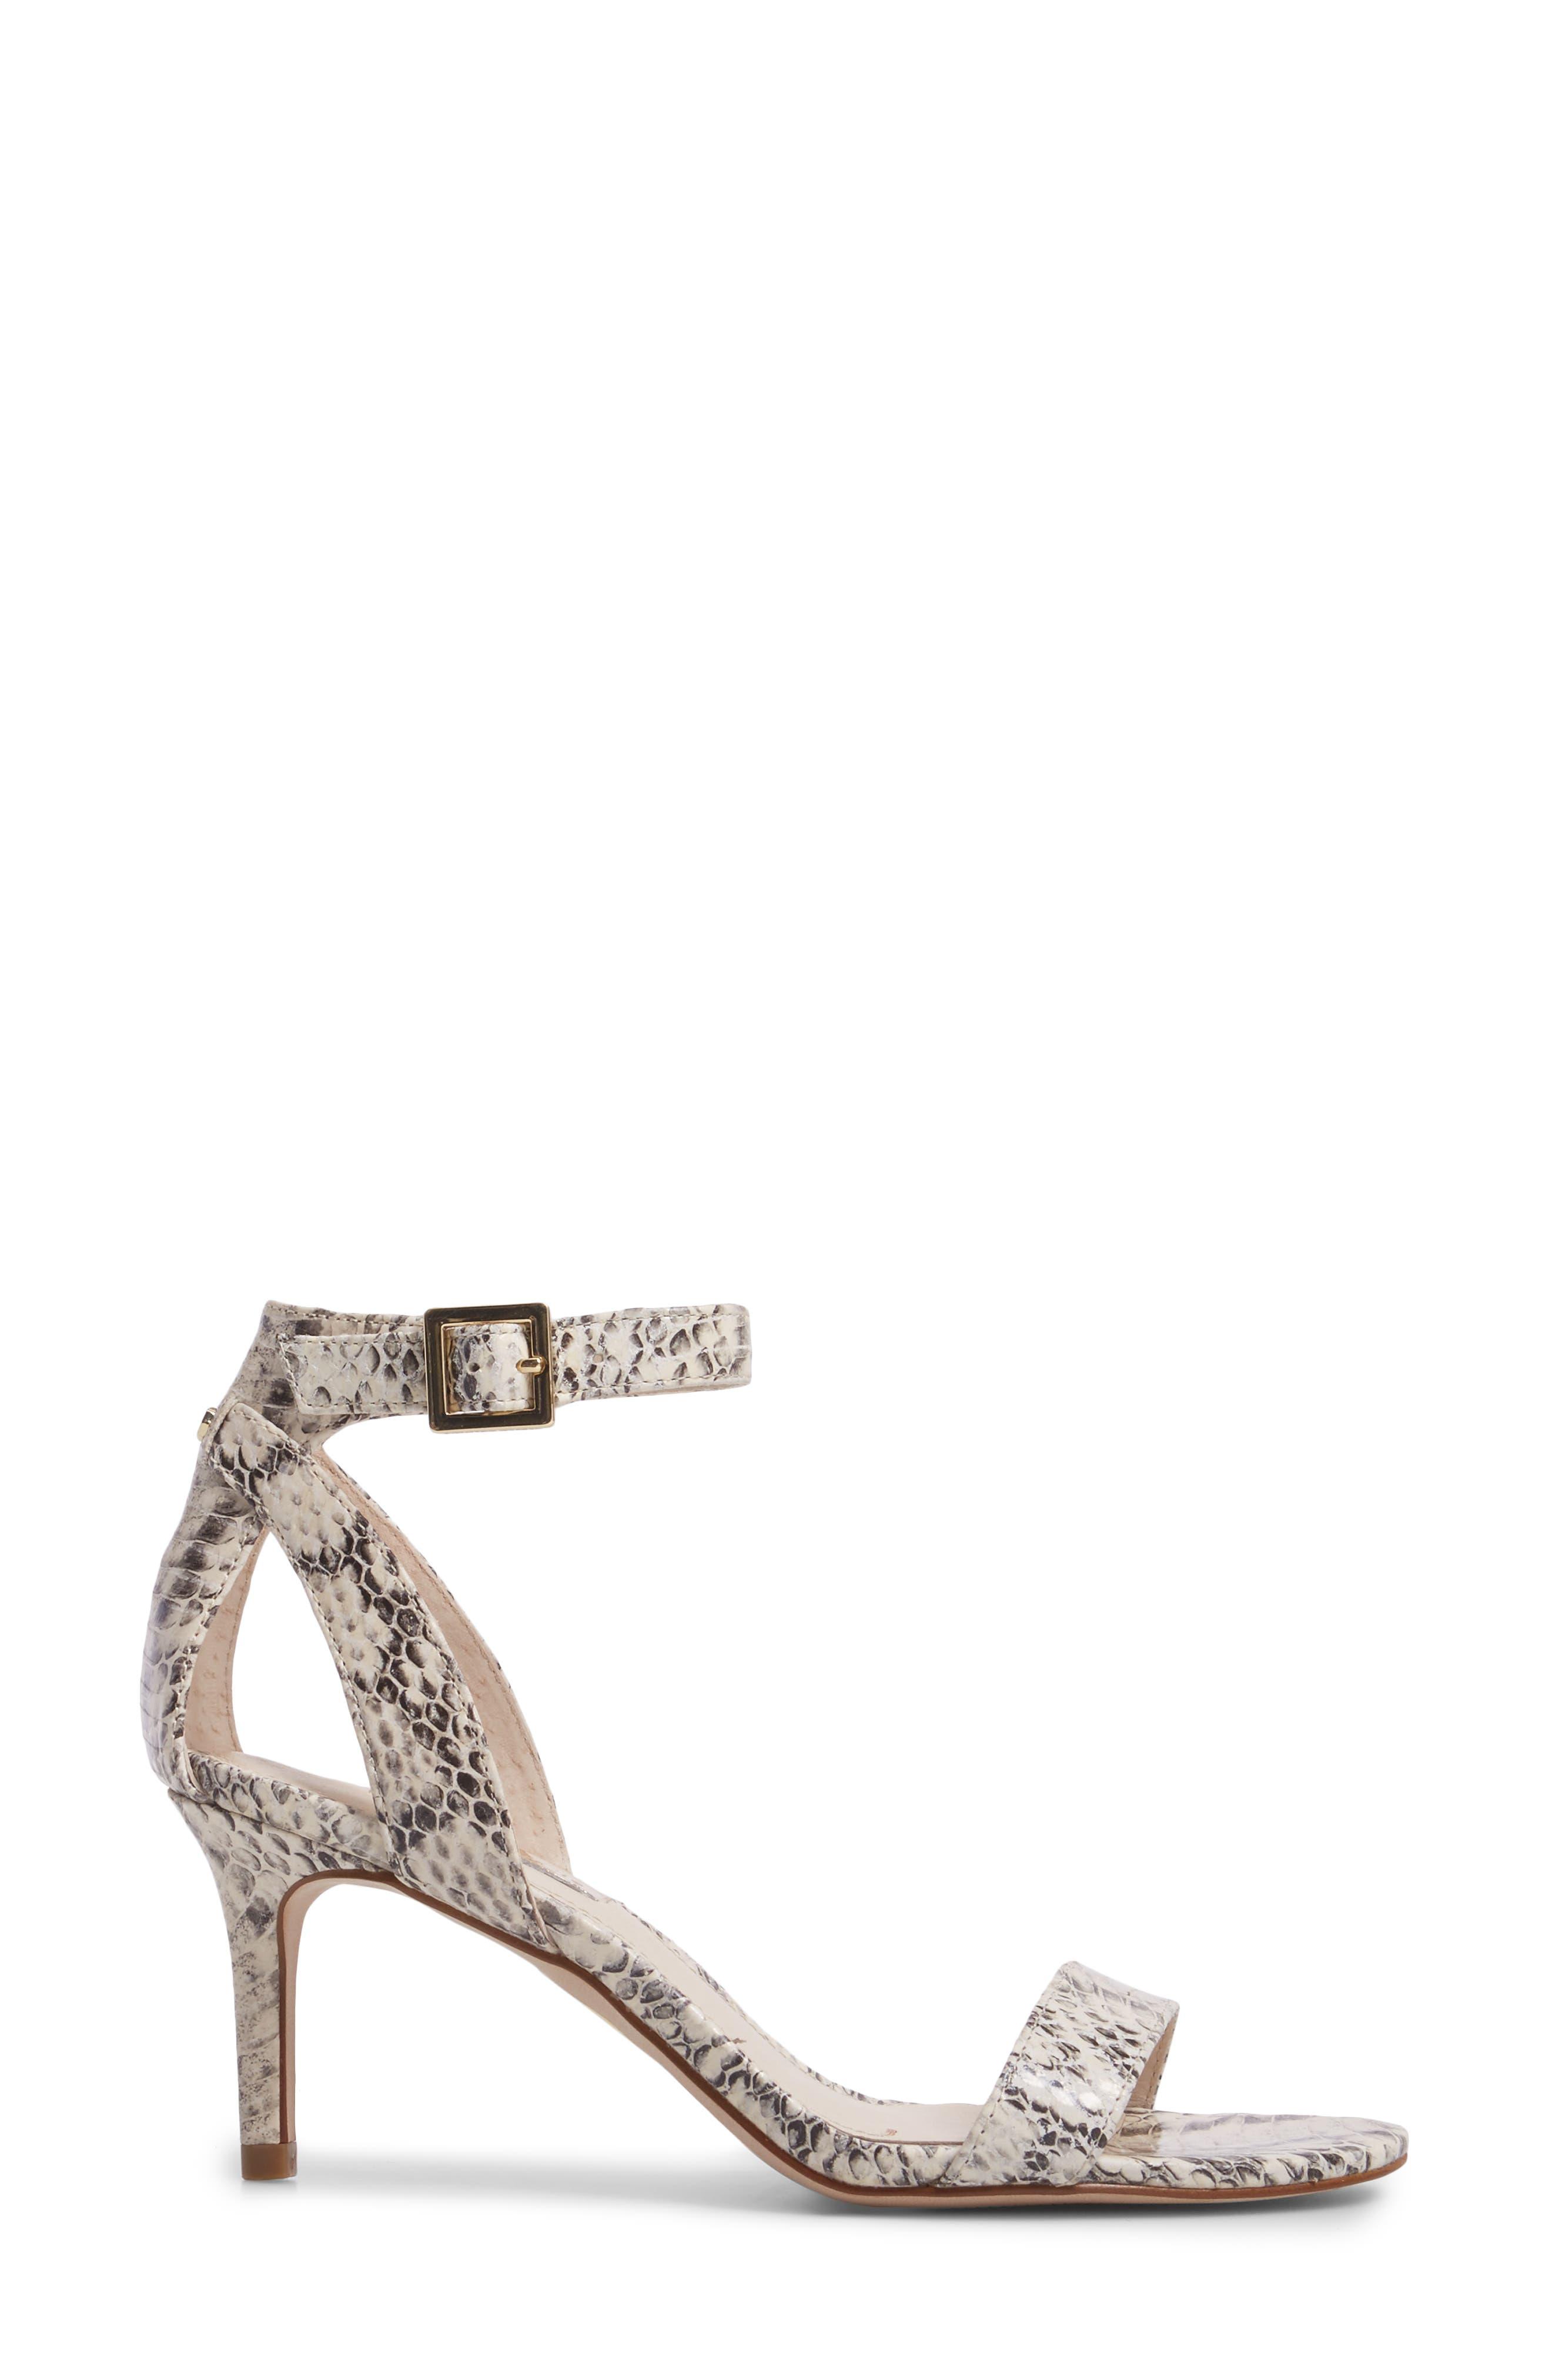 'Hyacinth' Ankle Strap Sandal,                             Alternate thumbnail 3, color,                             110